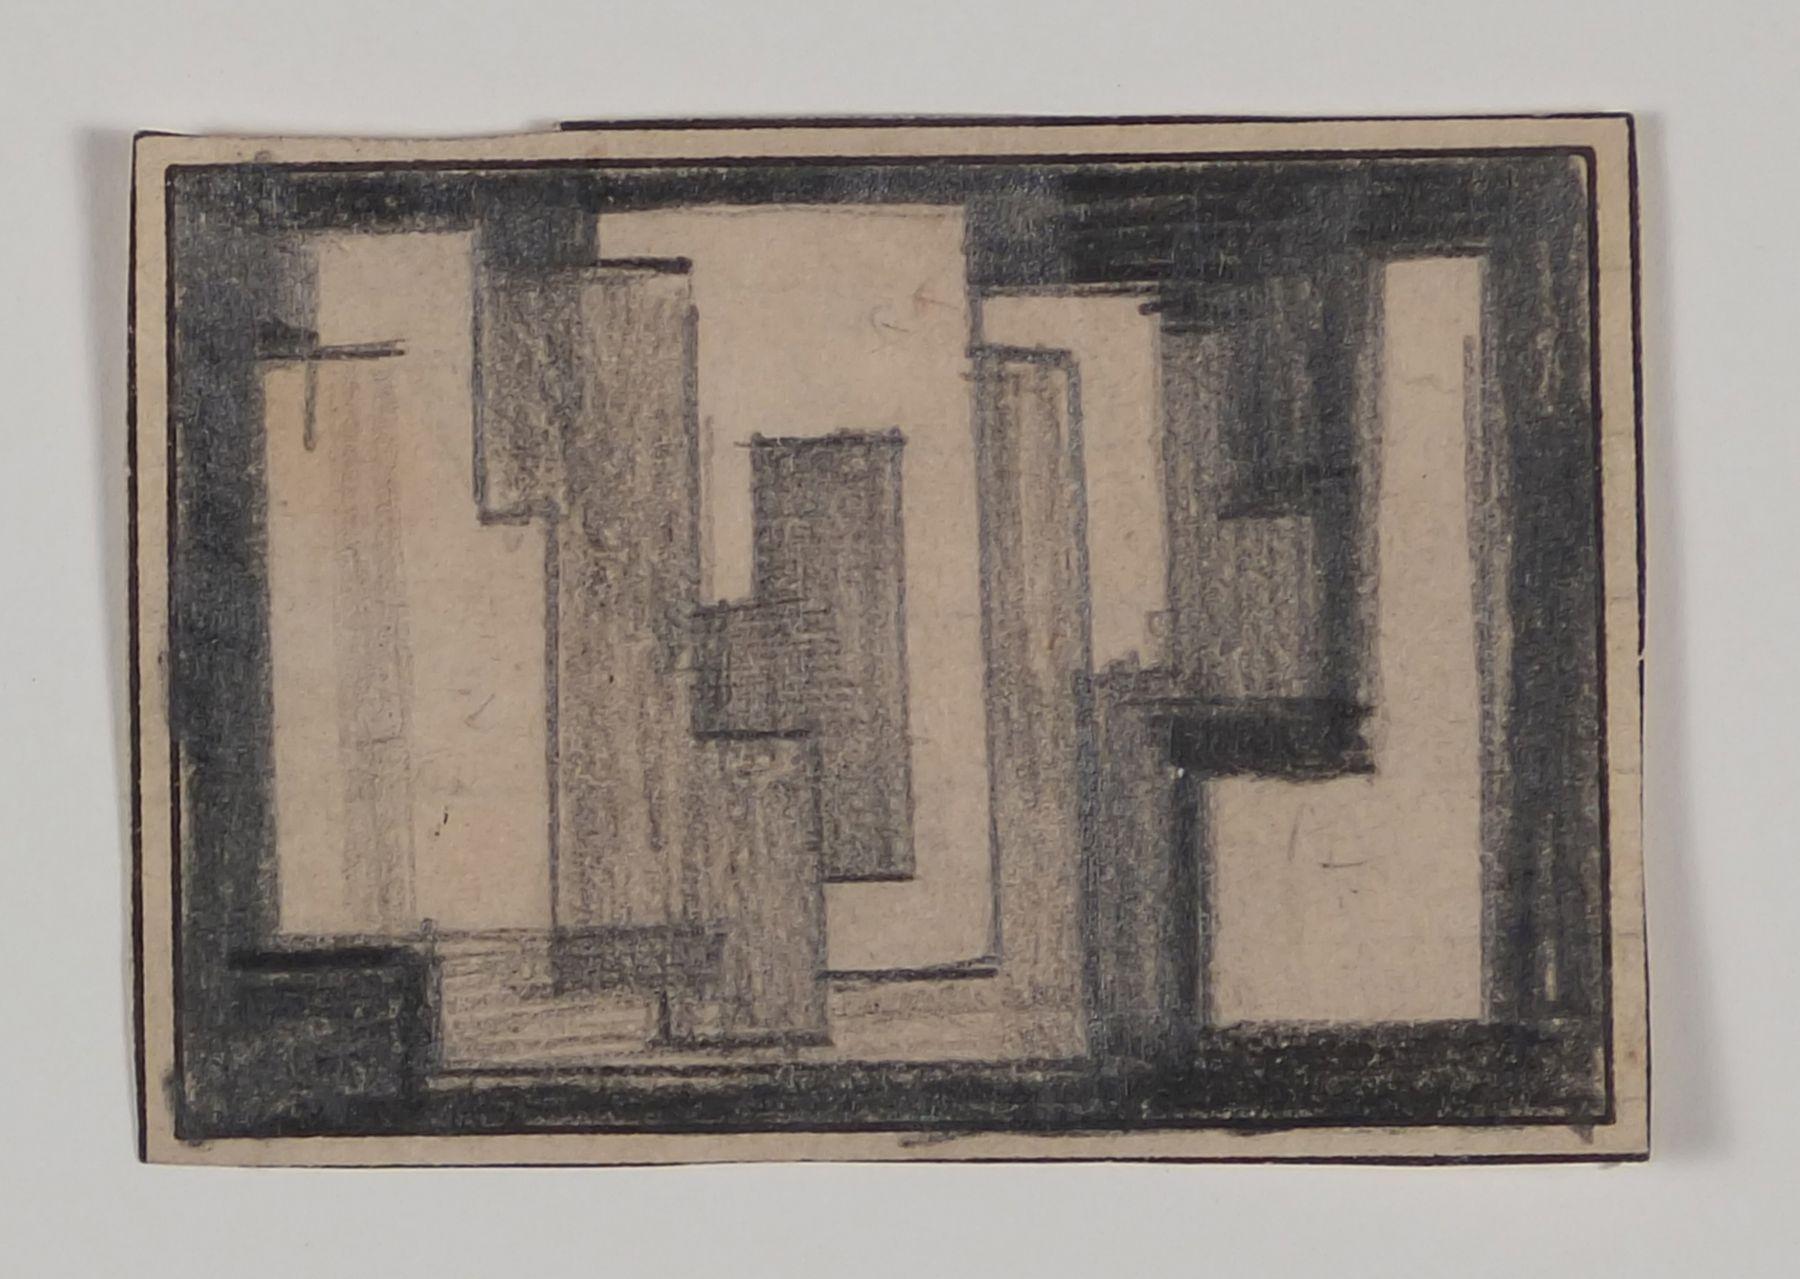 Antonio Asis,Untitled, 1955,Graphite on paper,1 5/8 x 2 1/4 in. (4.1 x 5.8 cm.)